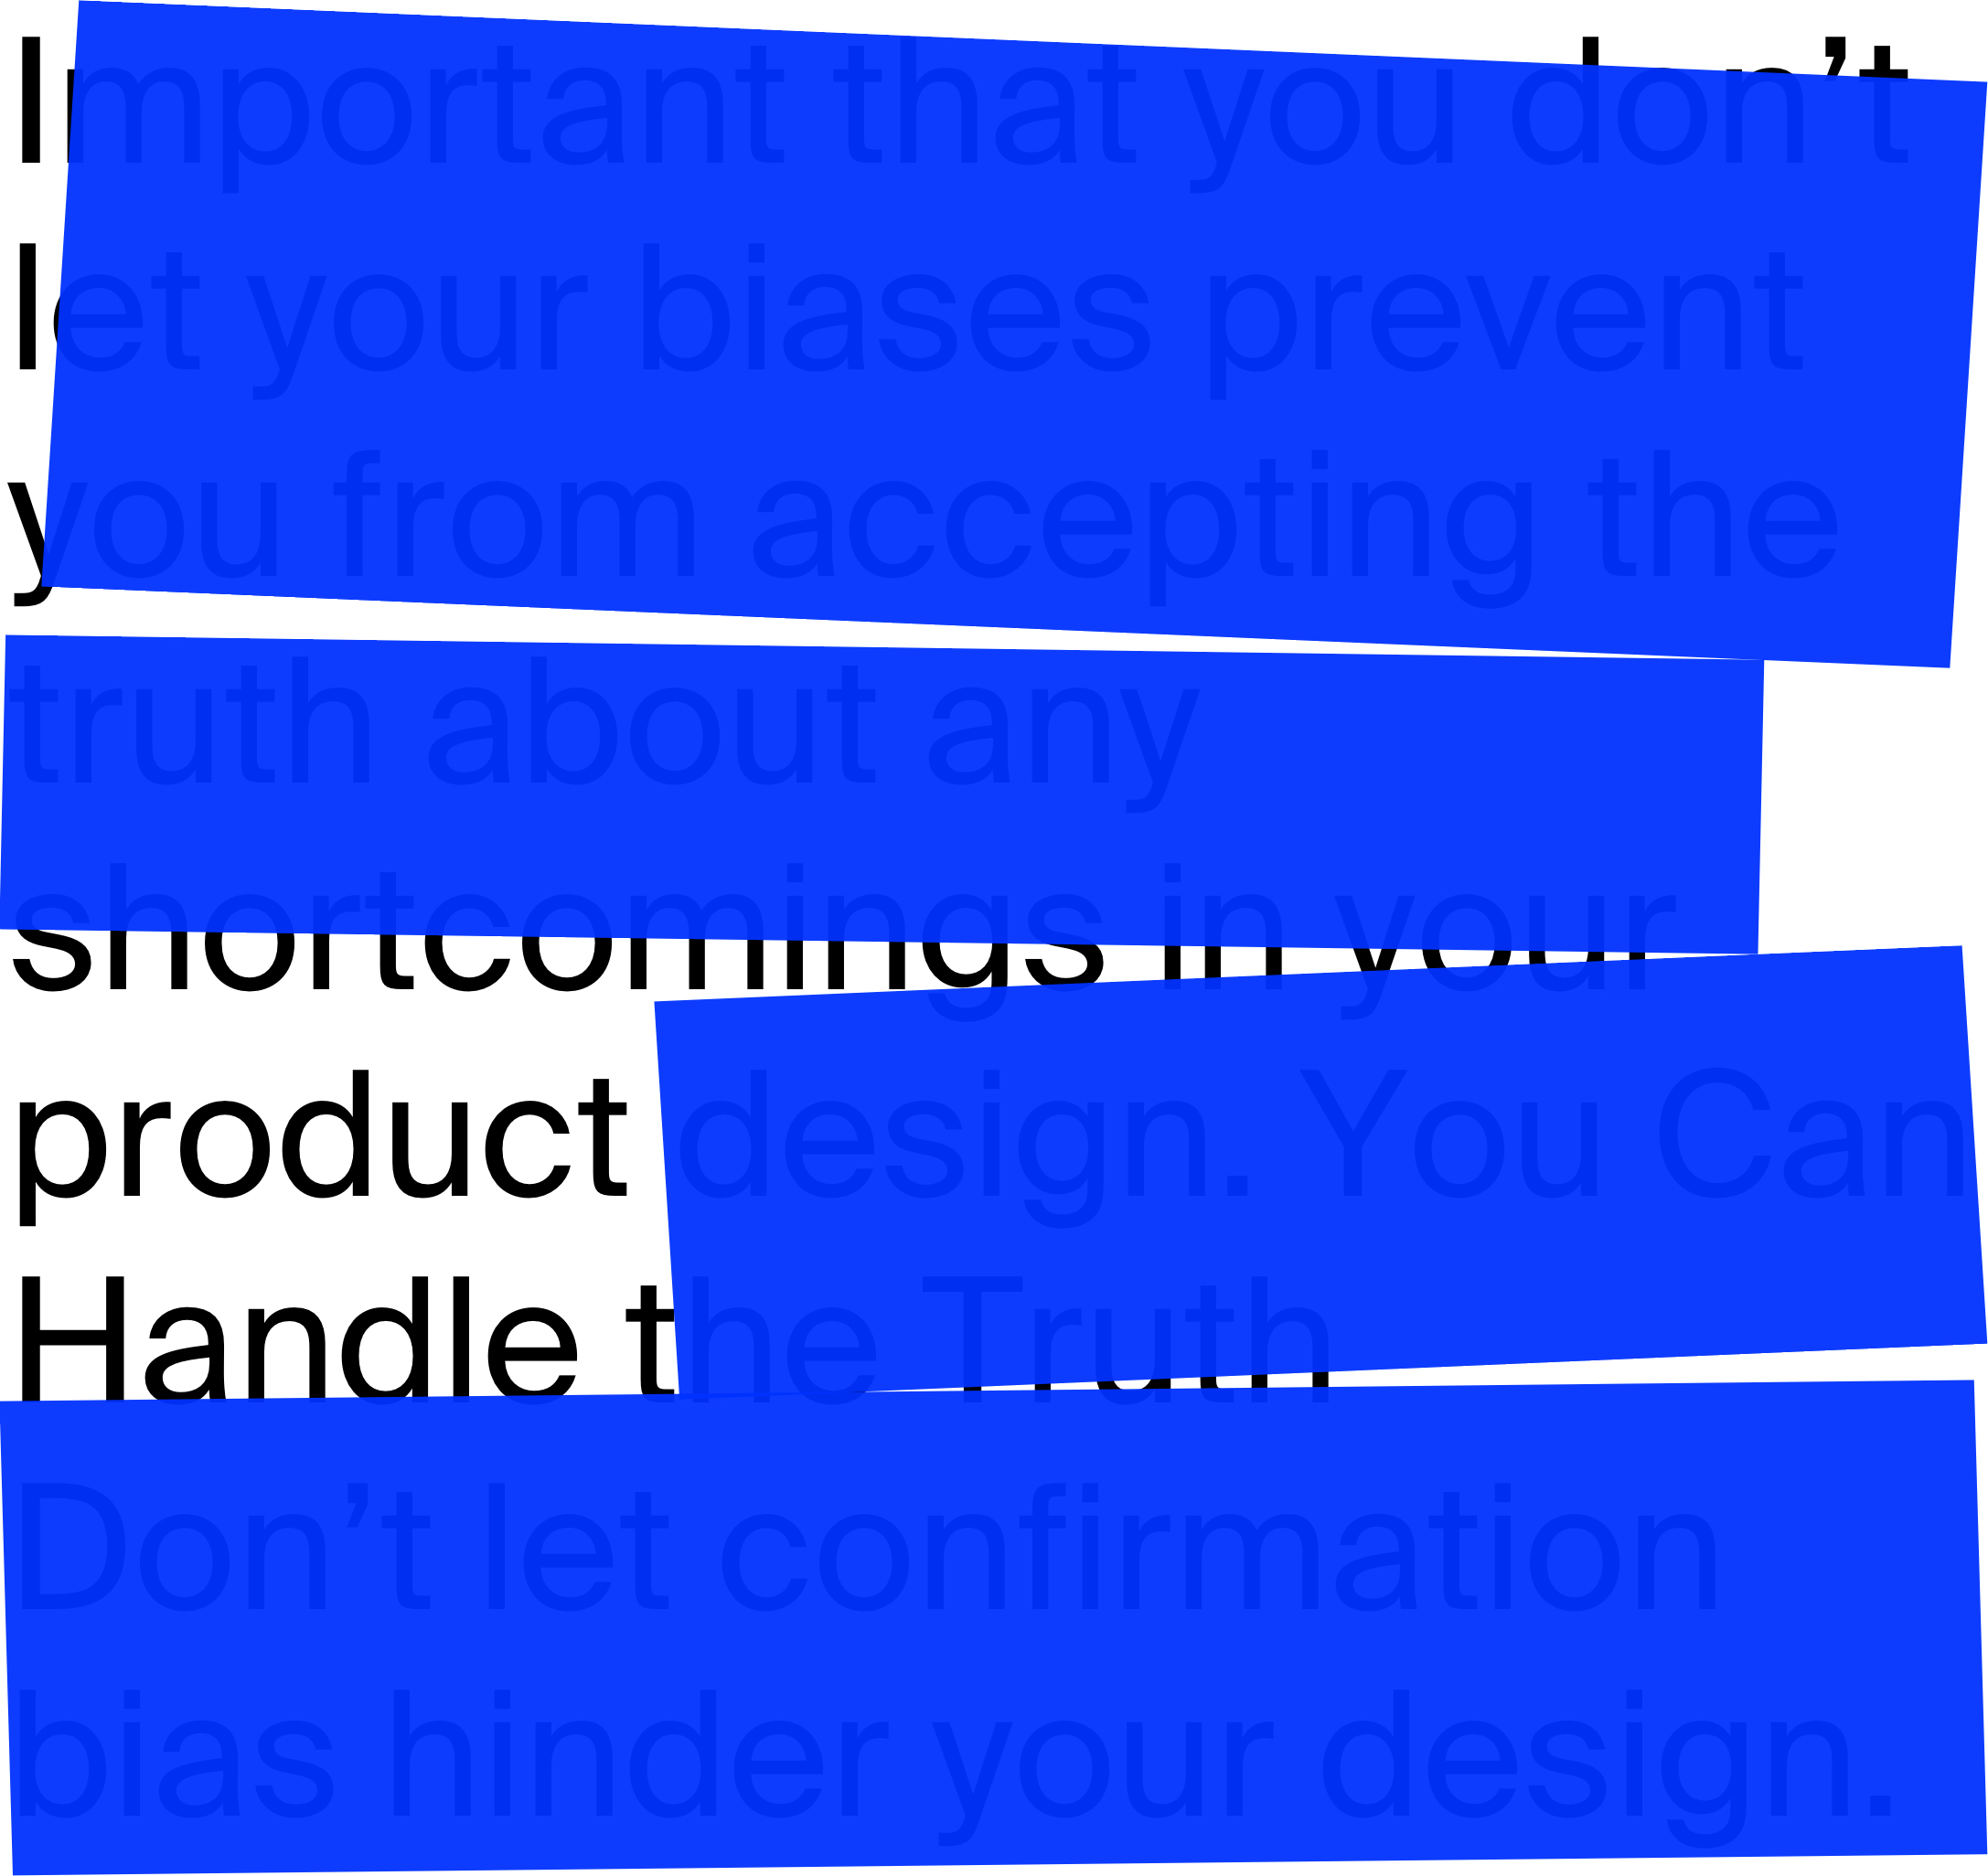 overcoming design bias header